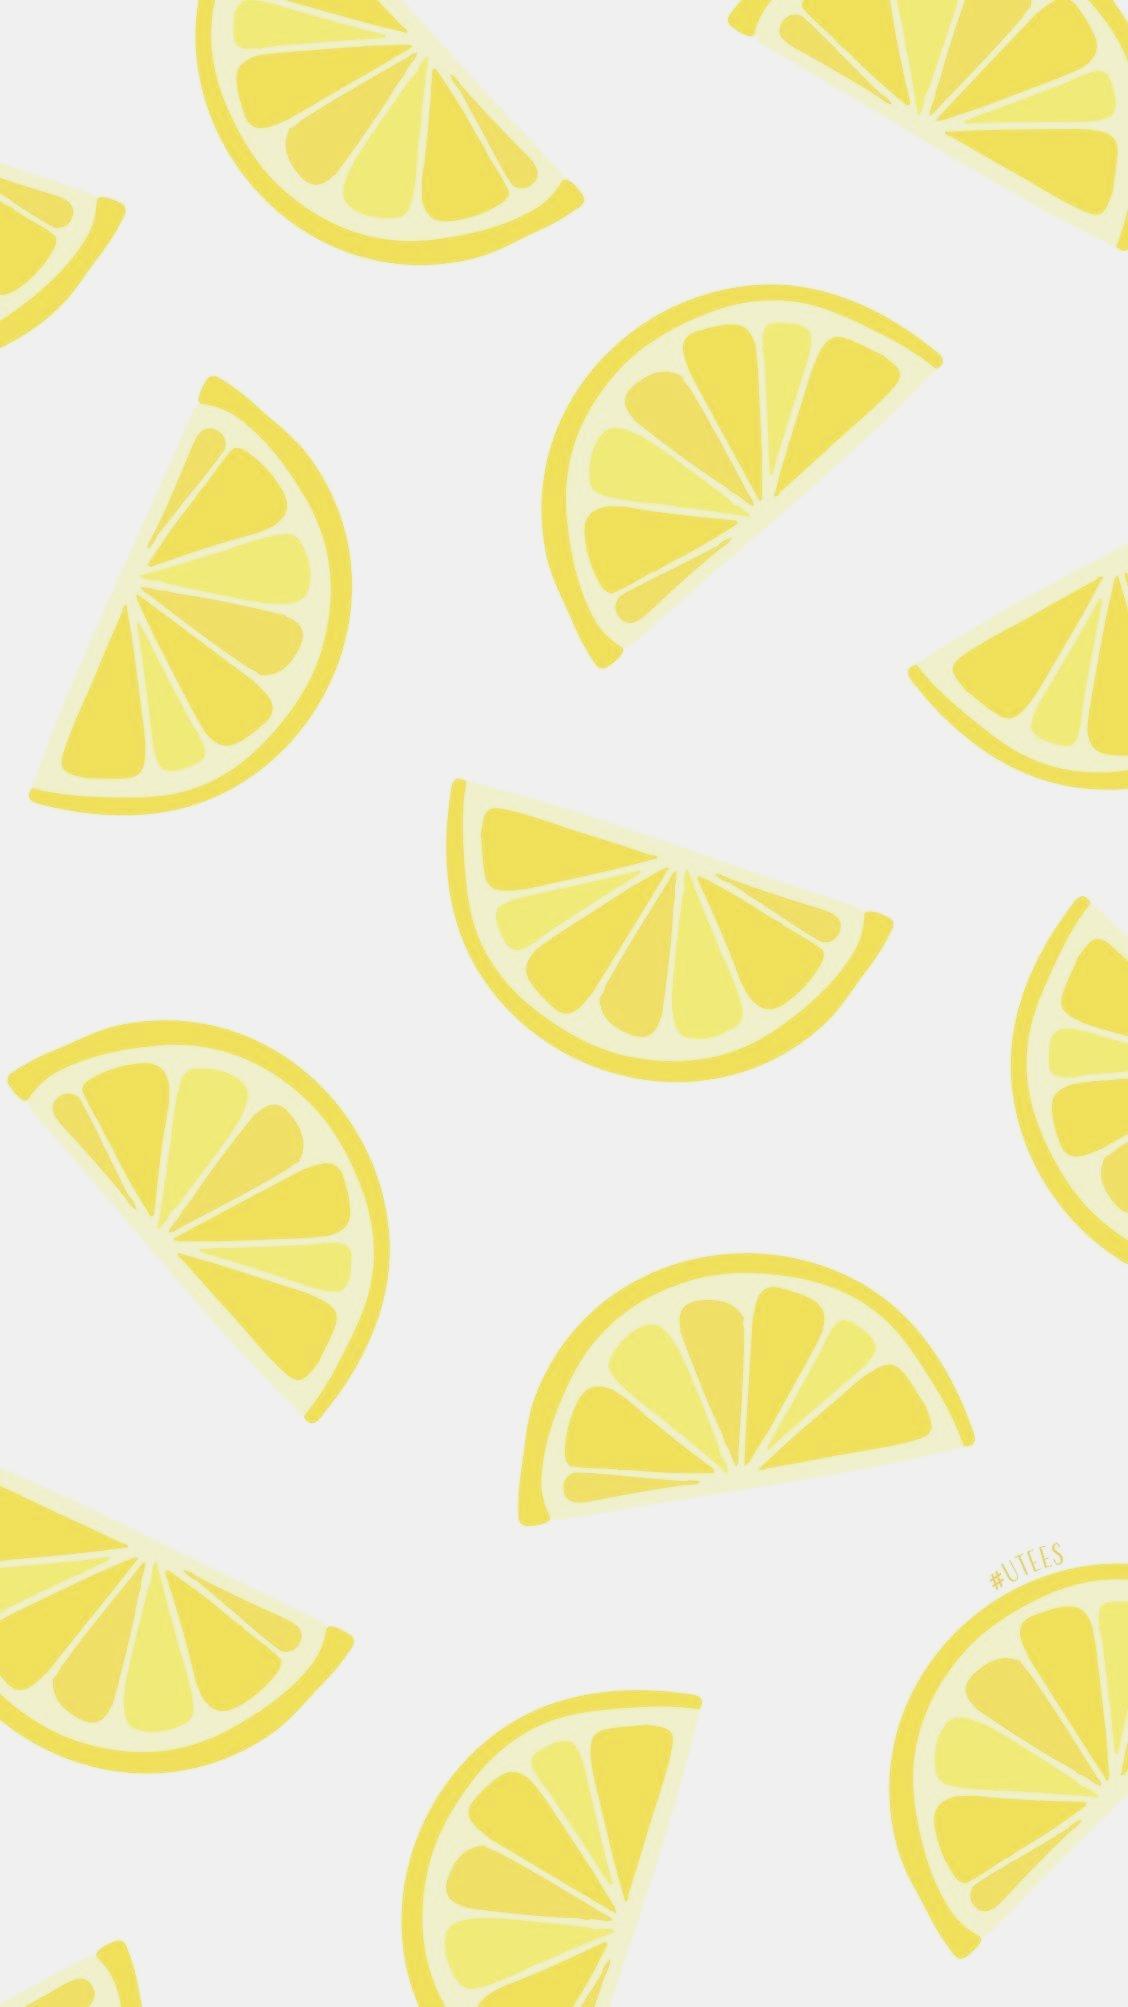 Lemon Love THy thyz Iphone Backgrounds I Summer Phone Cute